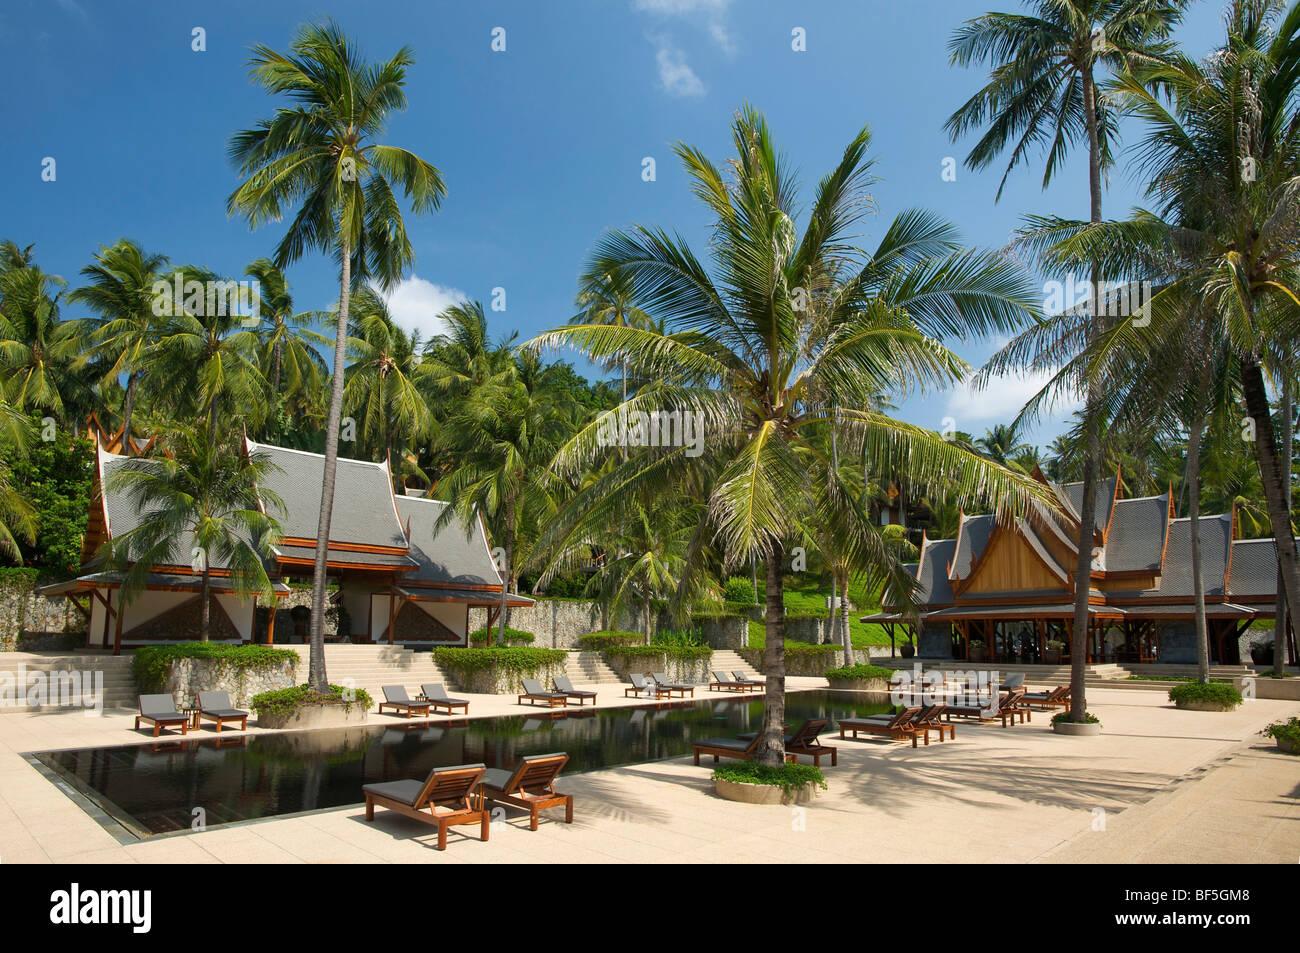 The Amanpuri Resort, Phuket Island, Thailand, Asia Stock Photo